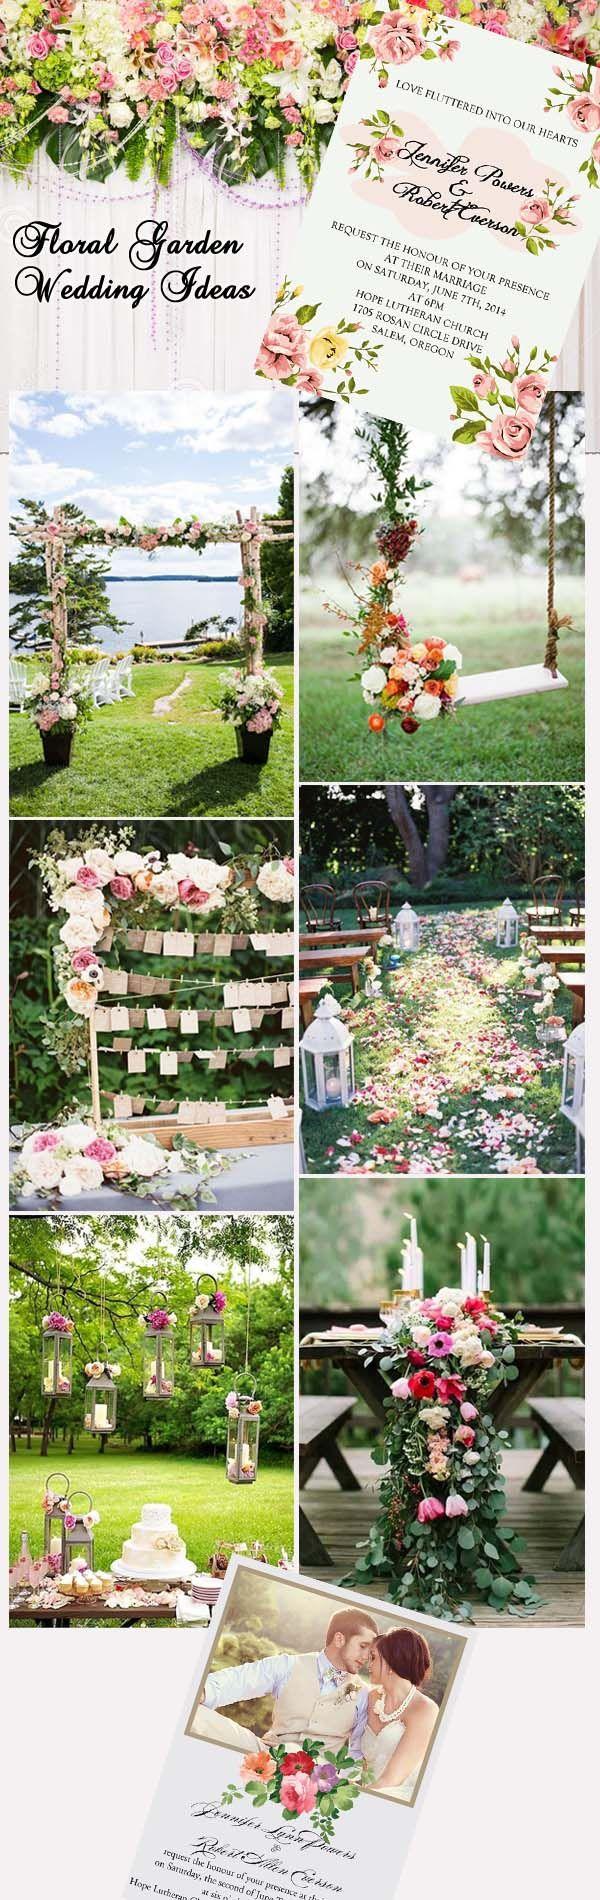 Wedding reception wedding decorations 2018 november 2018 Ten Trending Wedding Theme Ideas for   Theme ideas Top ten and